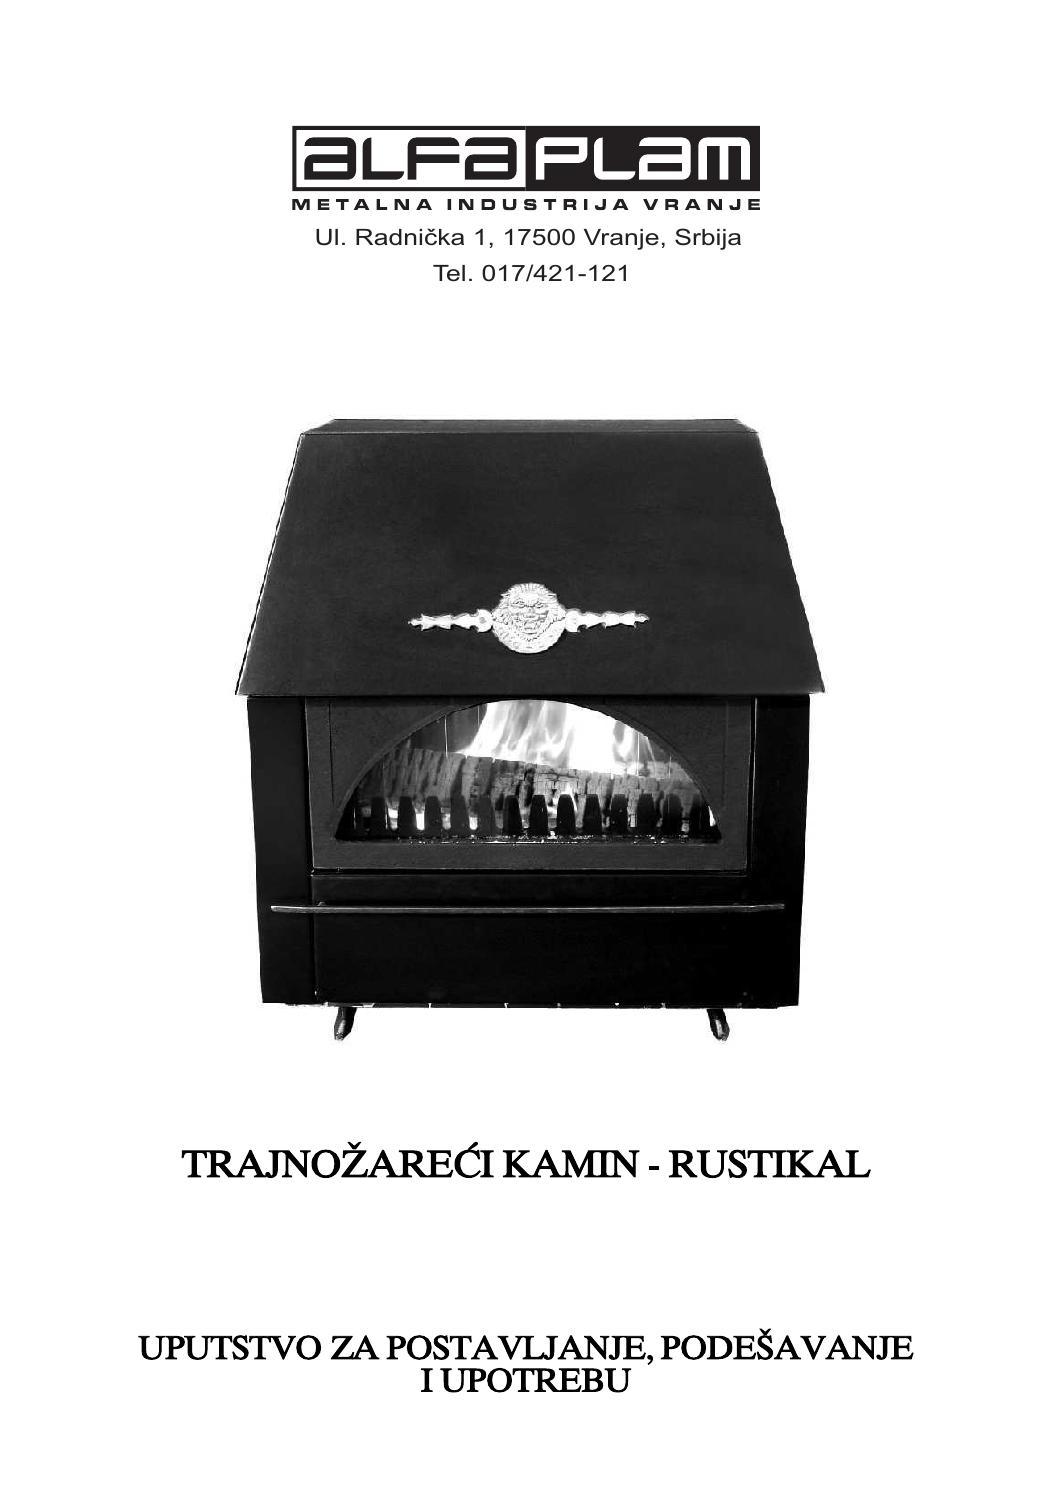 Uputstvo Za Kamin Rustikal By Madaco Issuu